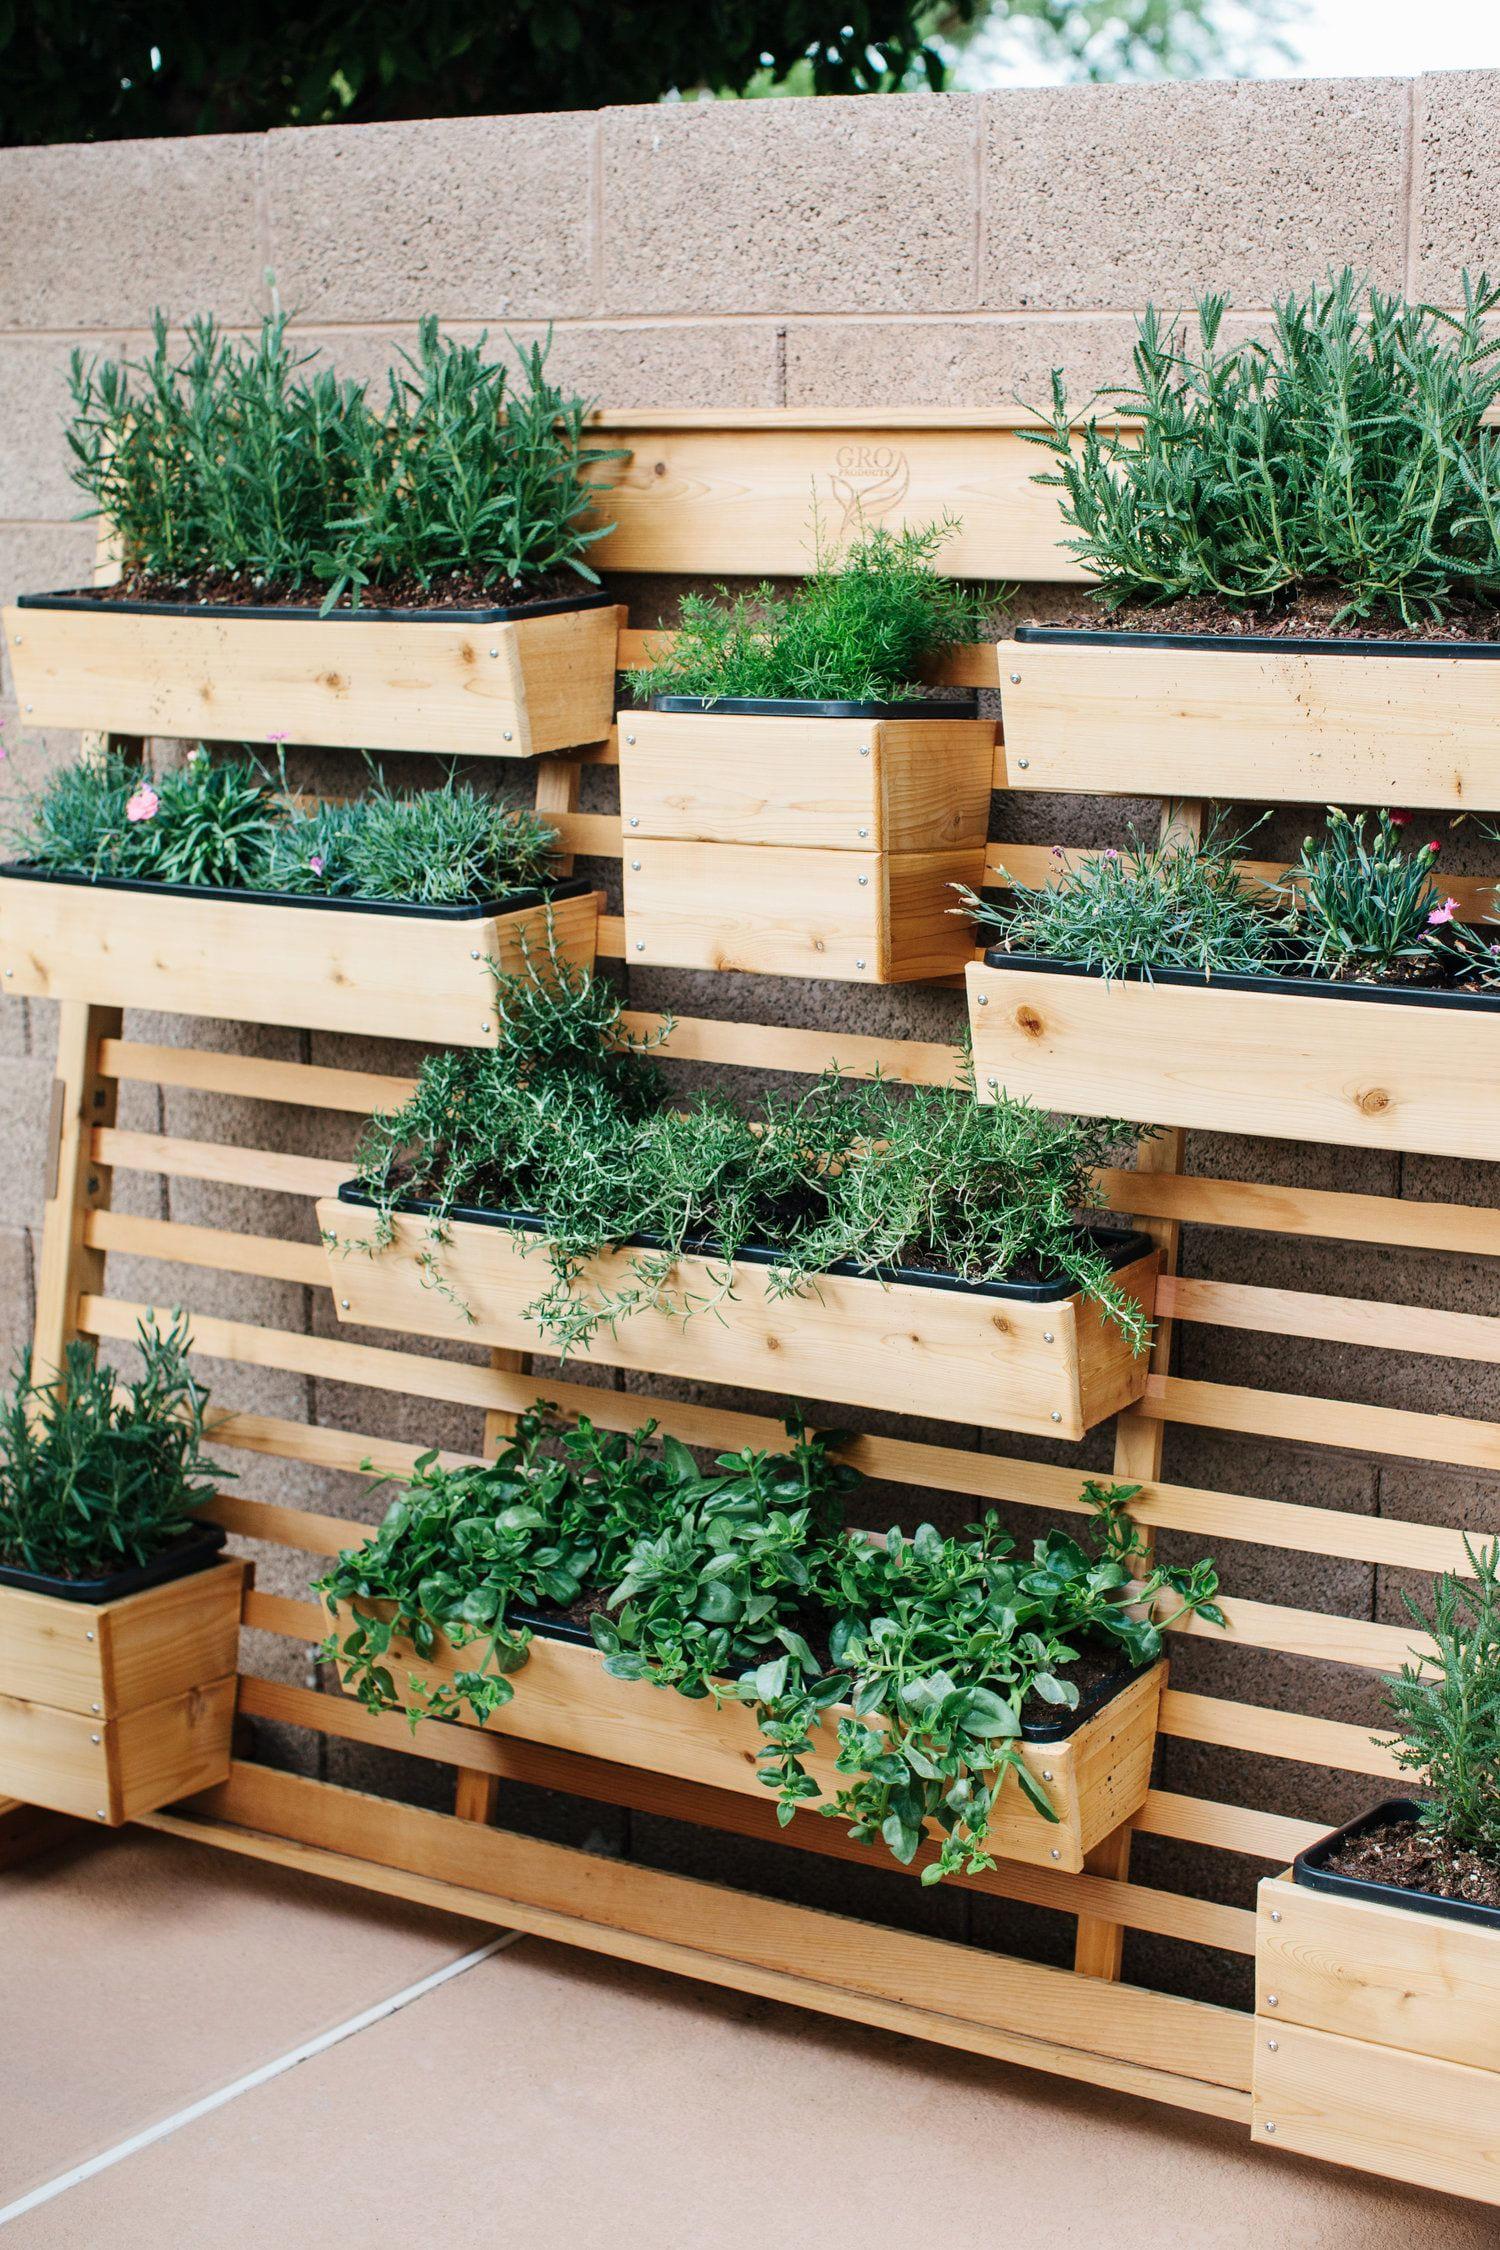 Simphome.com unique portable garden box garden ideas in box garden ideas Image Source www.allelive.com